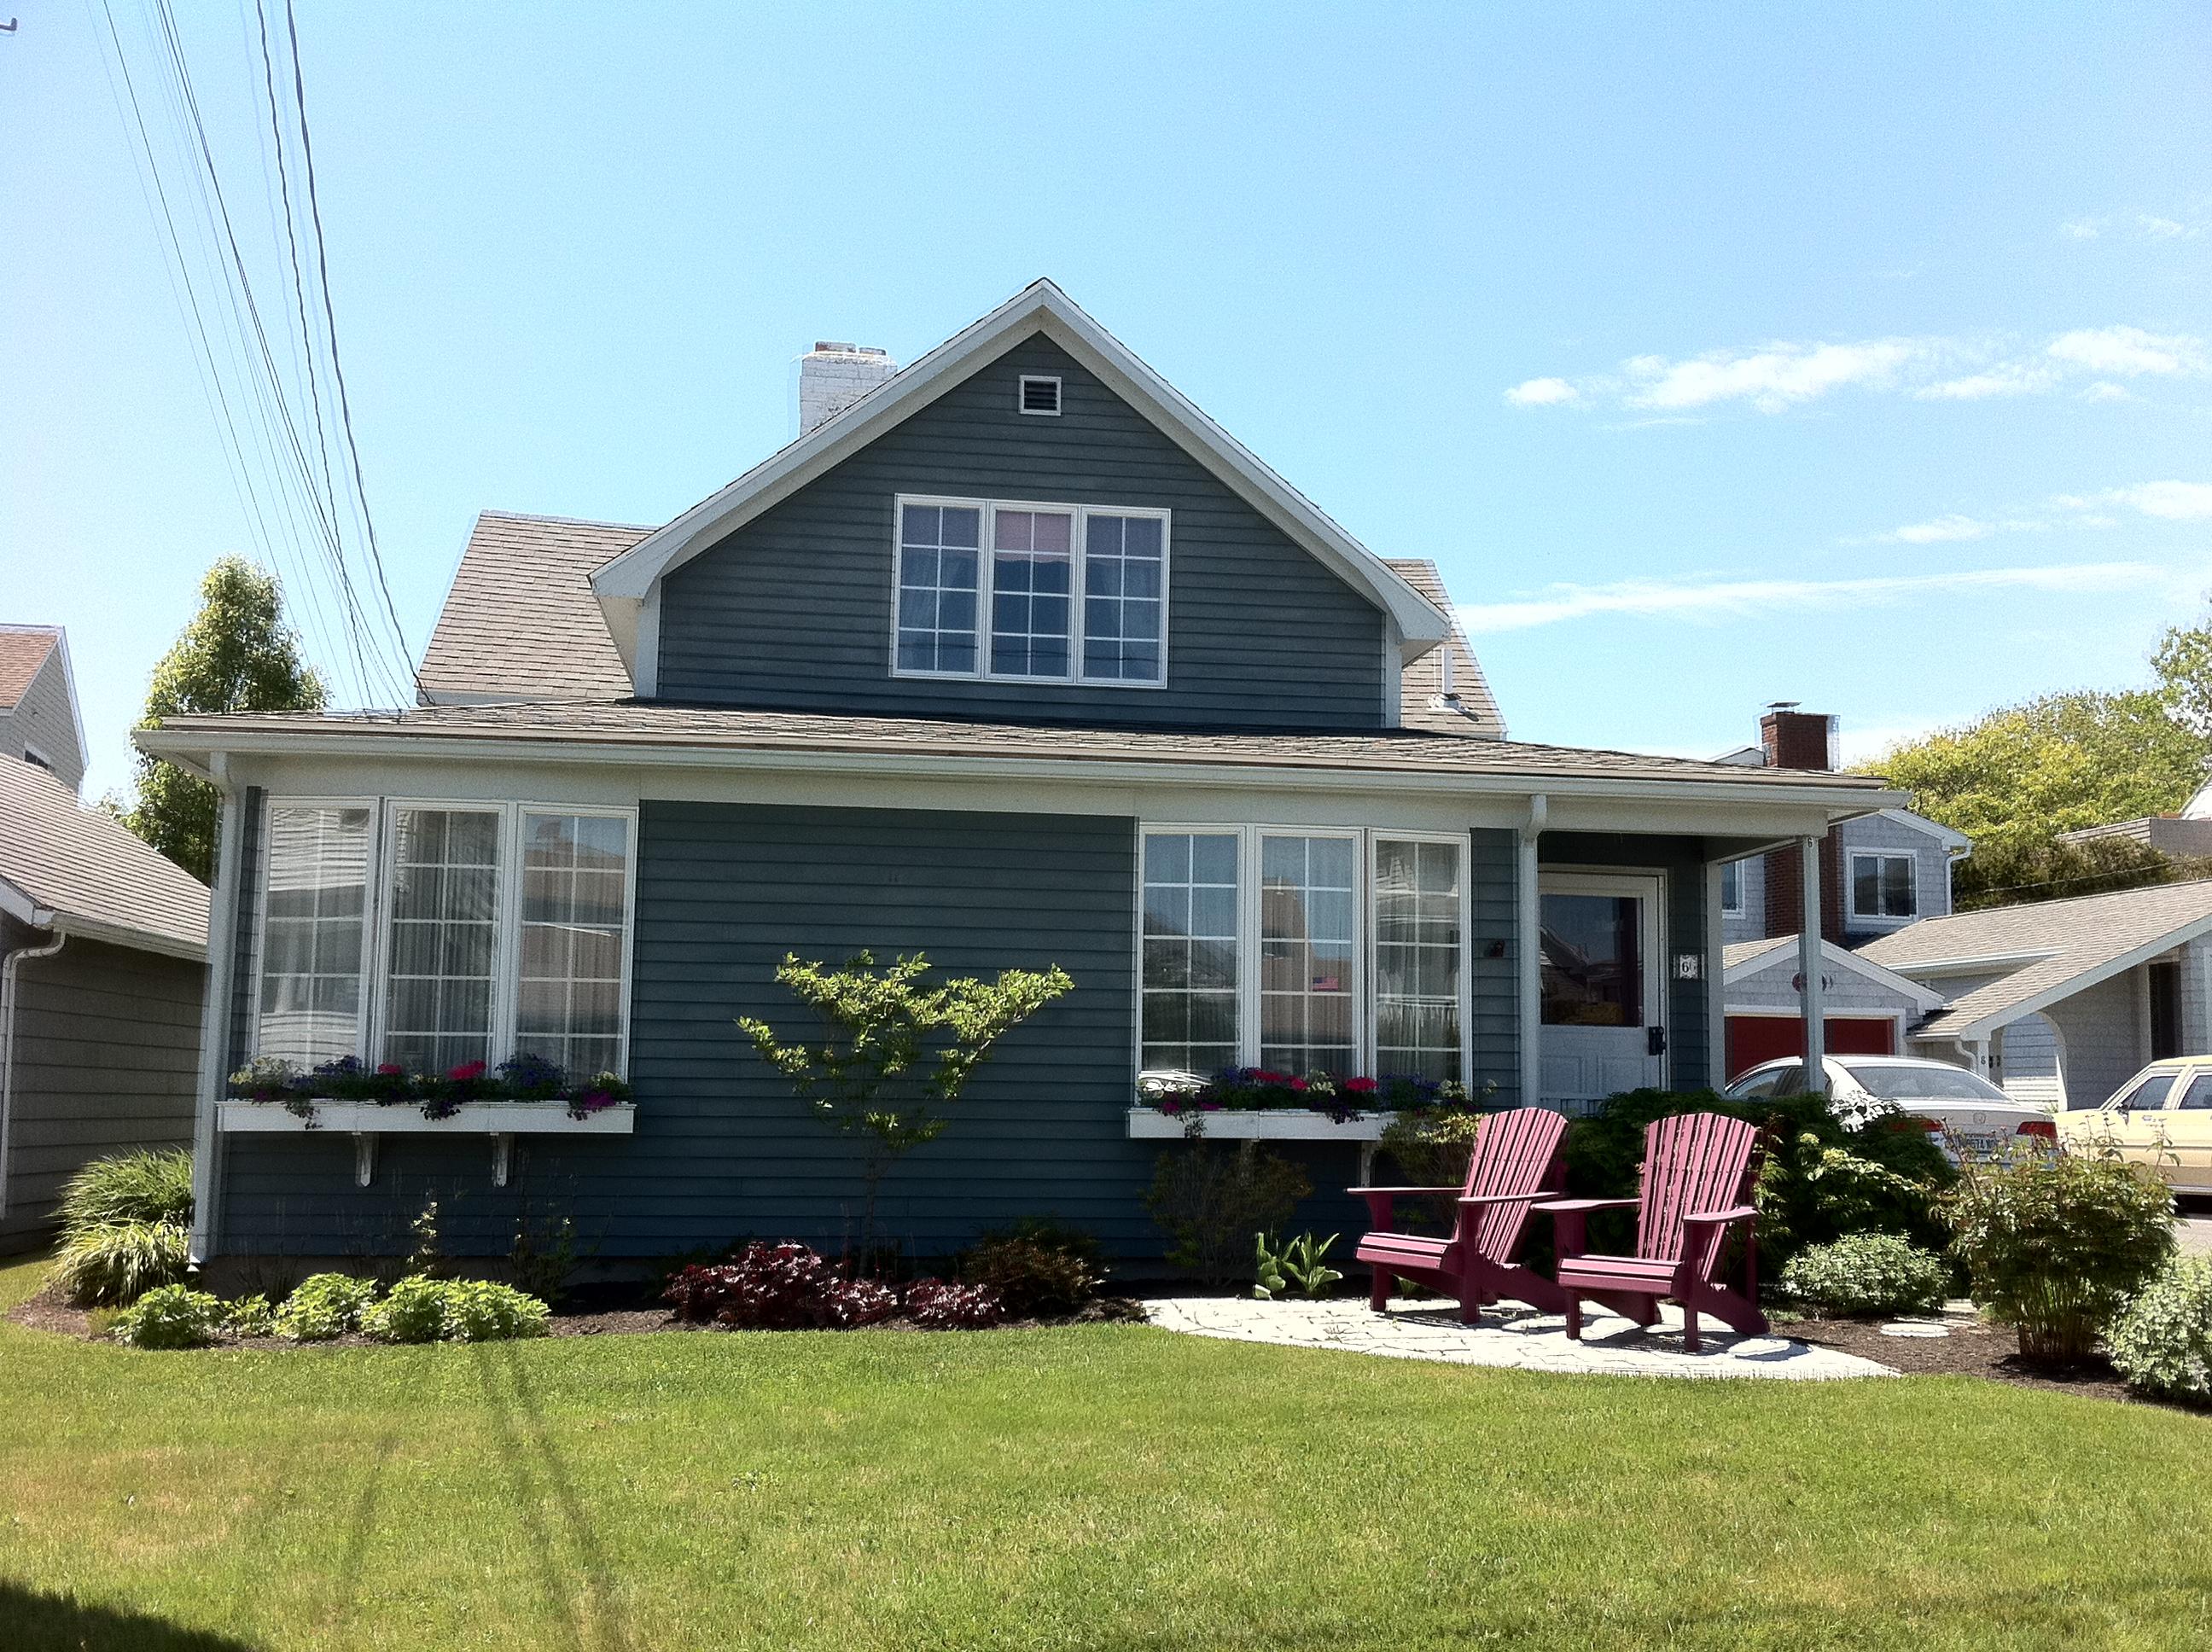 eye candy beach houses. Black Bedroom Furniture Sets. Home Design Ideas